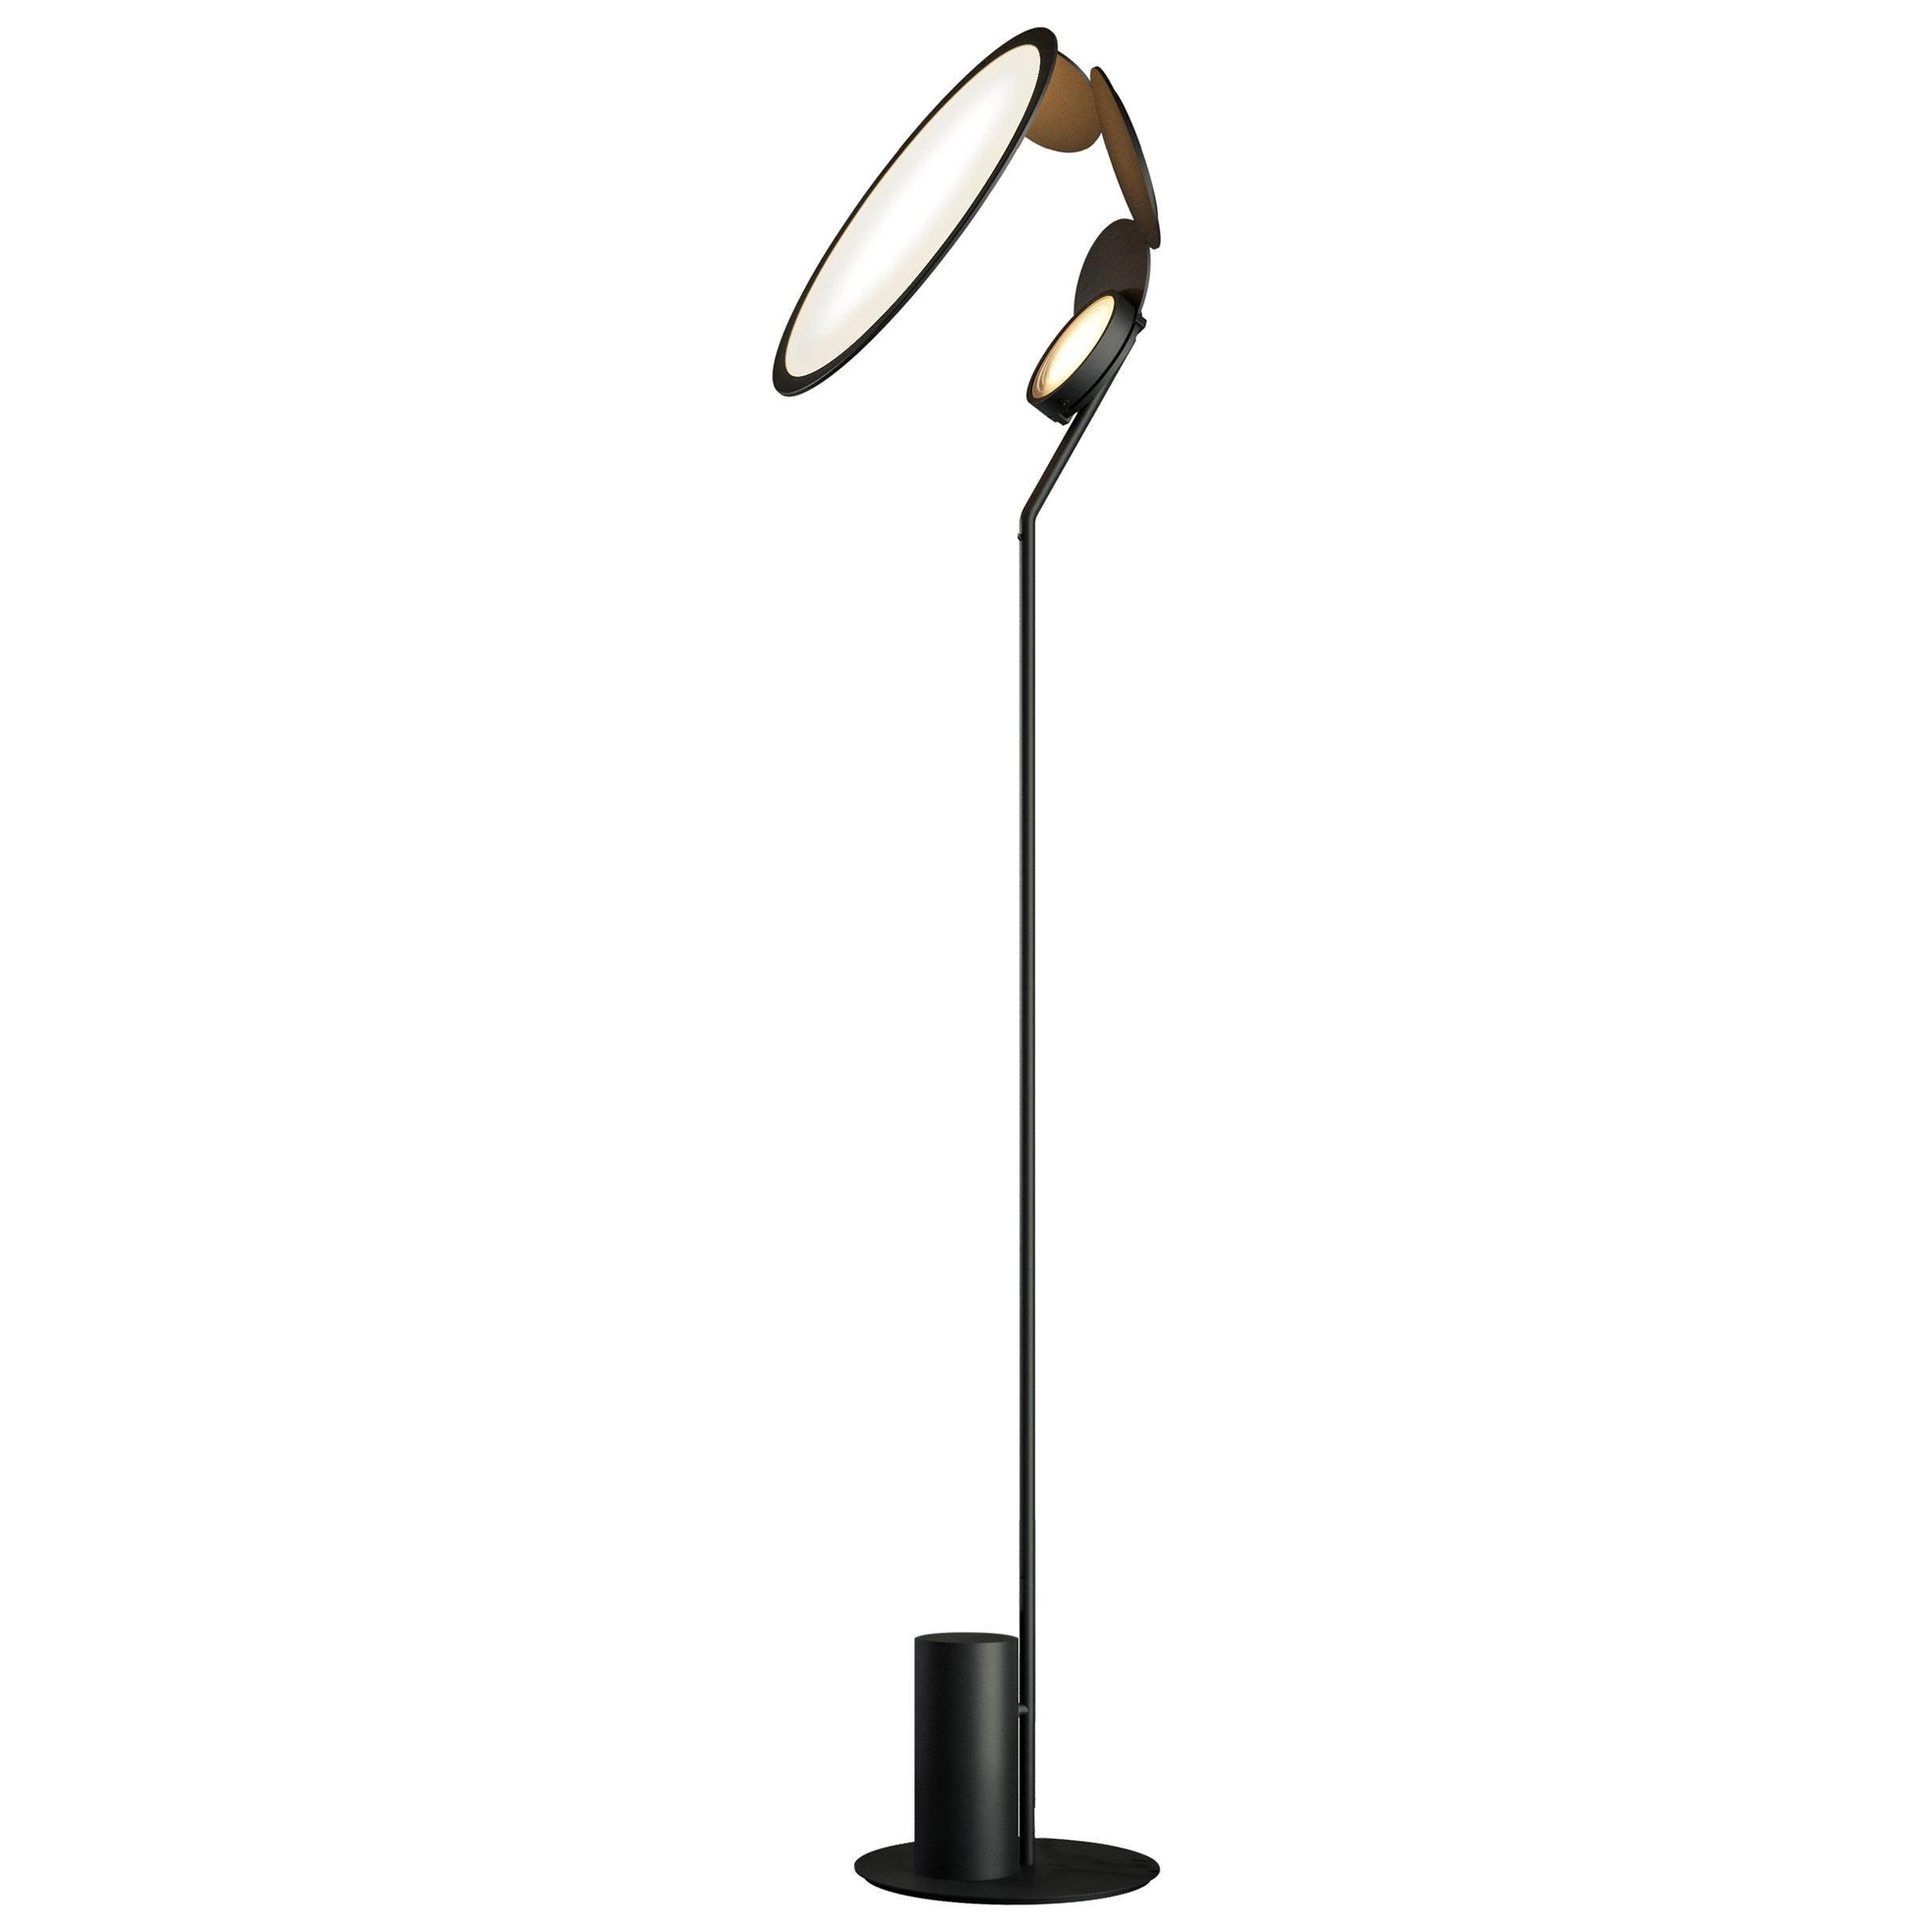 Cut Modern Aluminum LED Floor Lamp by Timo Ripatti